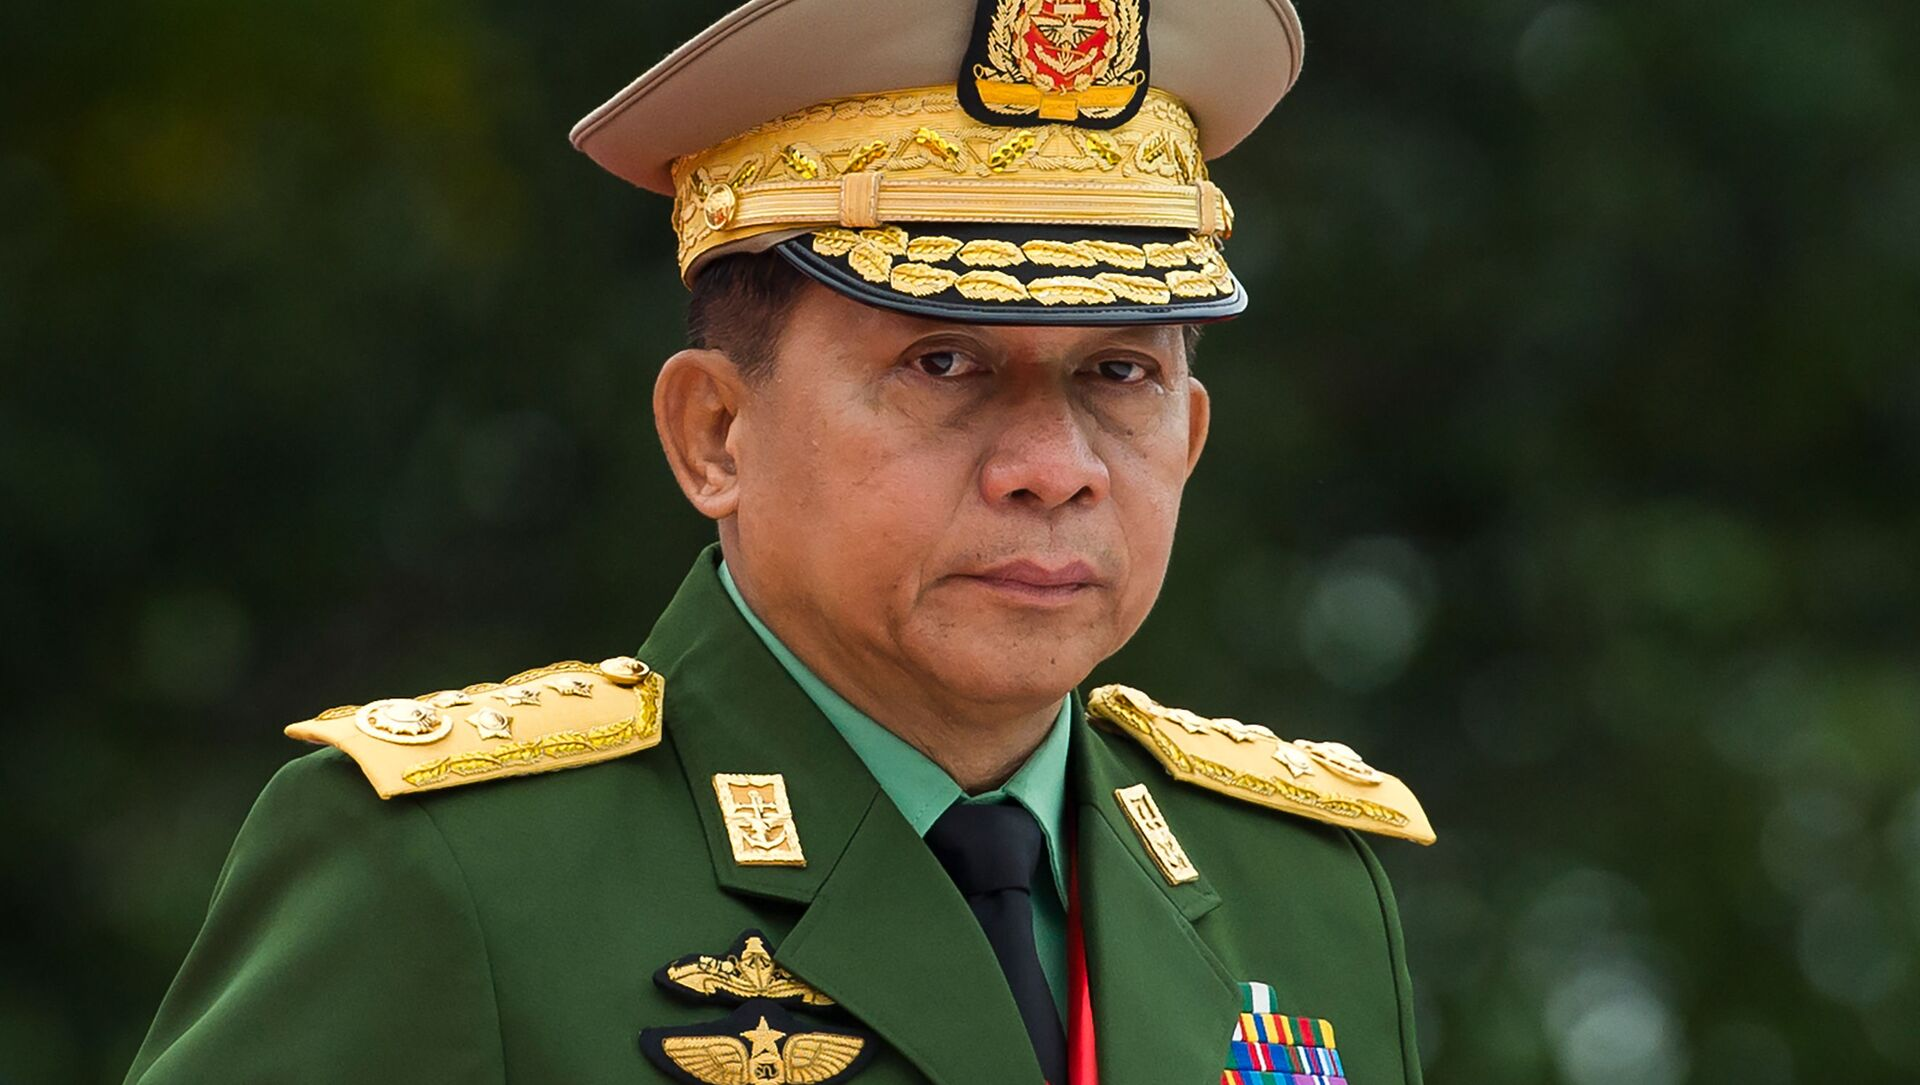 Min Aung Hlaing, comandante militare di Myanmar  - Sputnik Italia, 1920, 07.02.2021